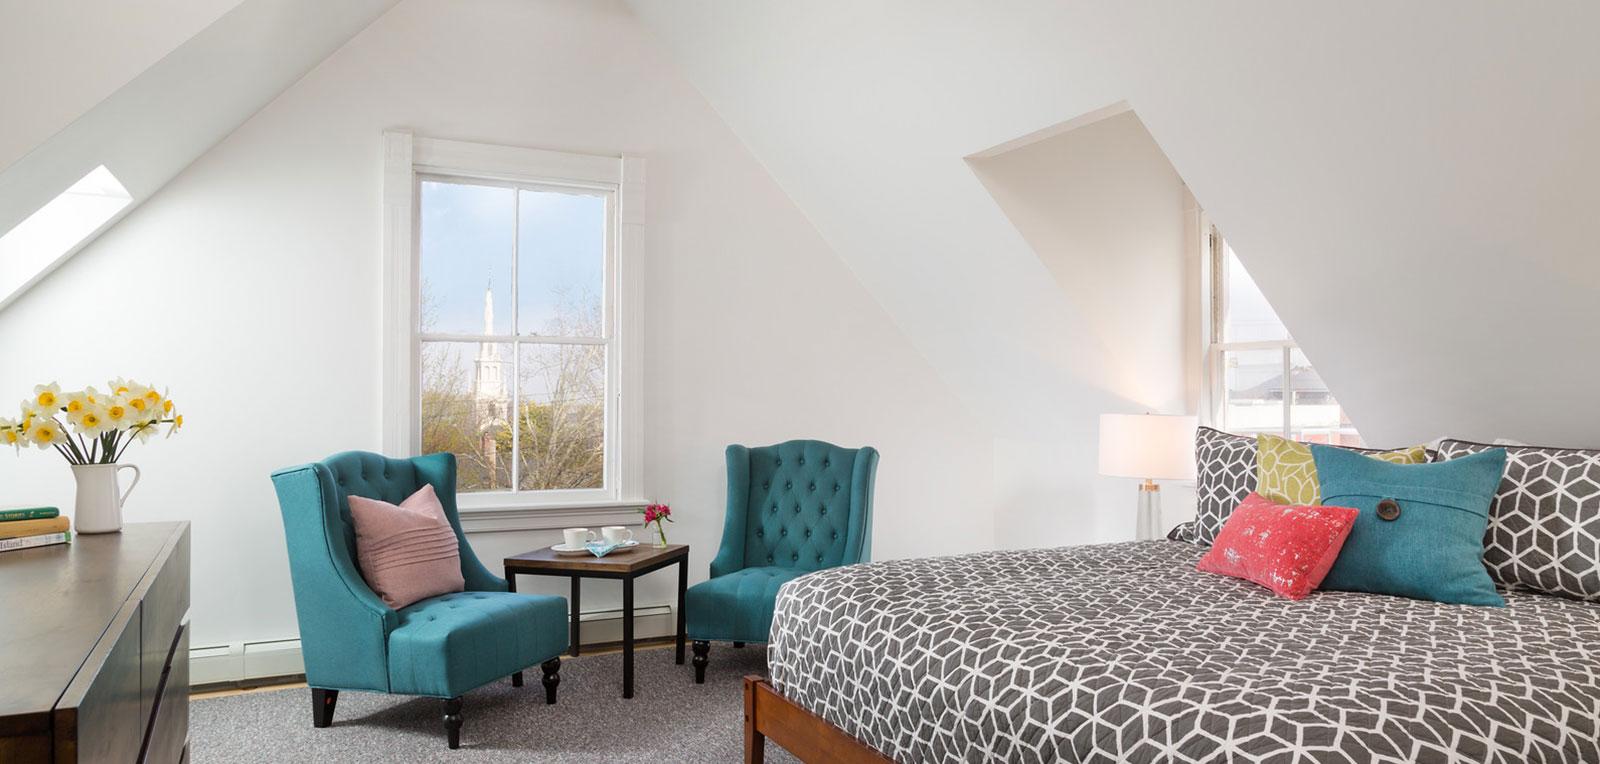 2BR Apartment Bedroom | ADMIRAL SIMS B&B, Newport Rhode Island